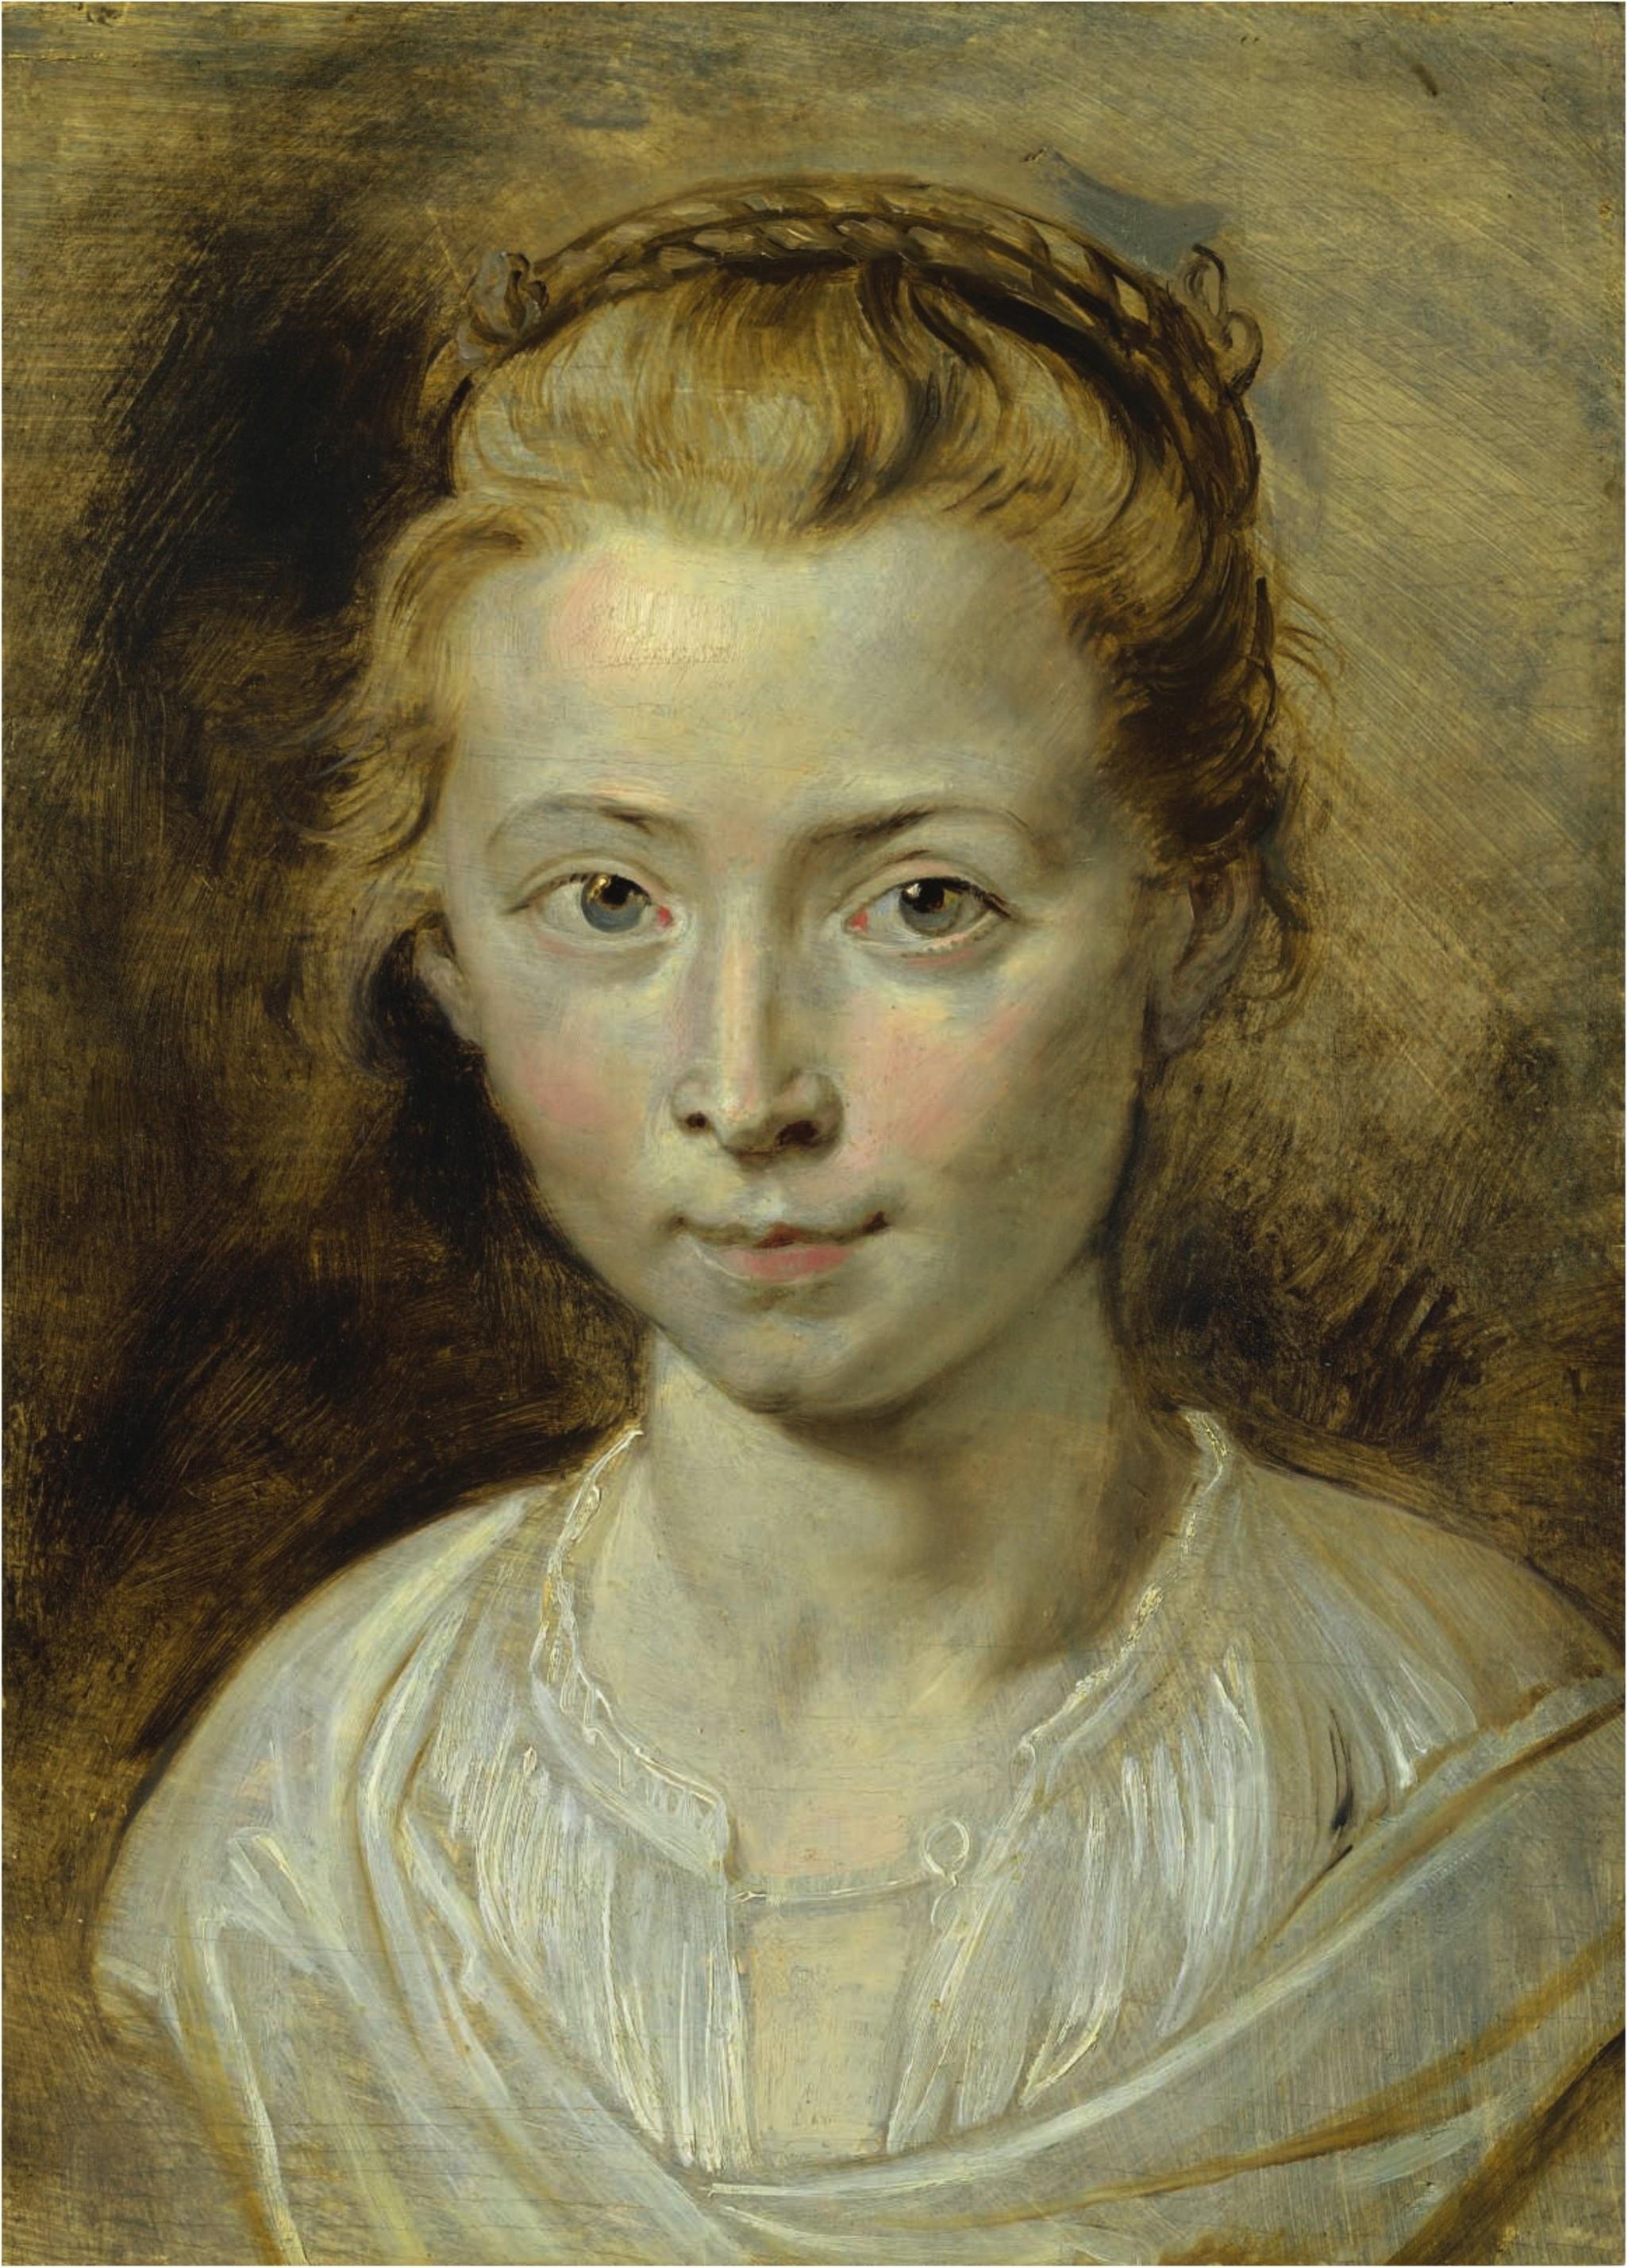 Peter Paul Rubens (1577-1640) Portrait of Clara Serena, the artist's daughter